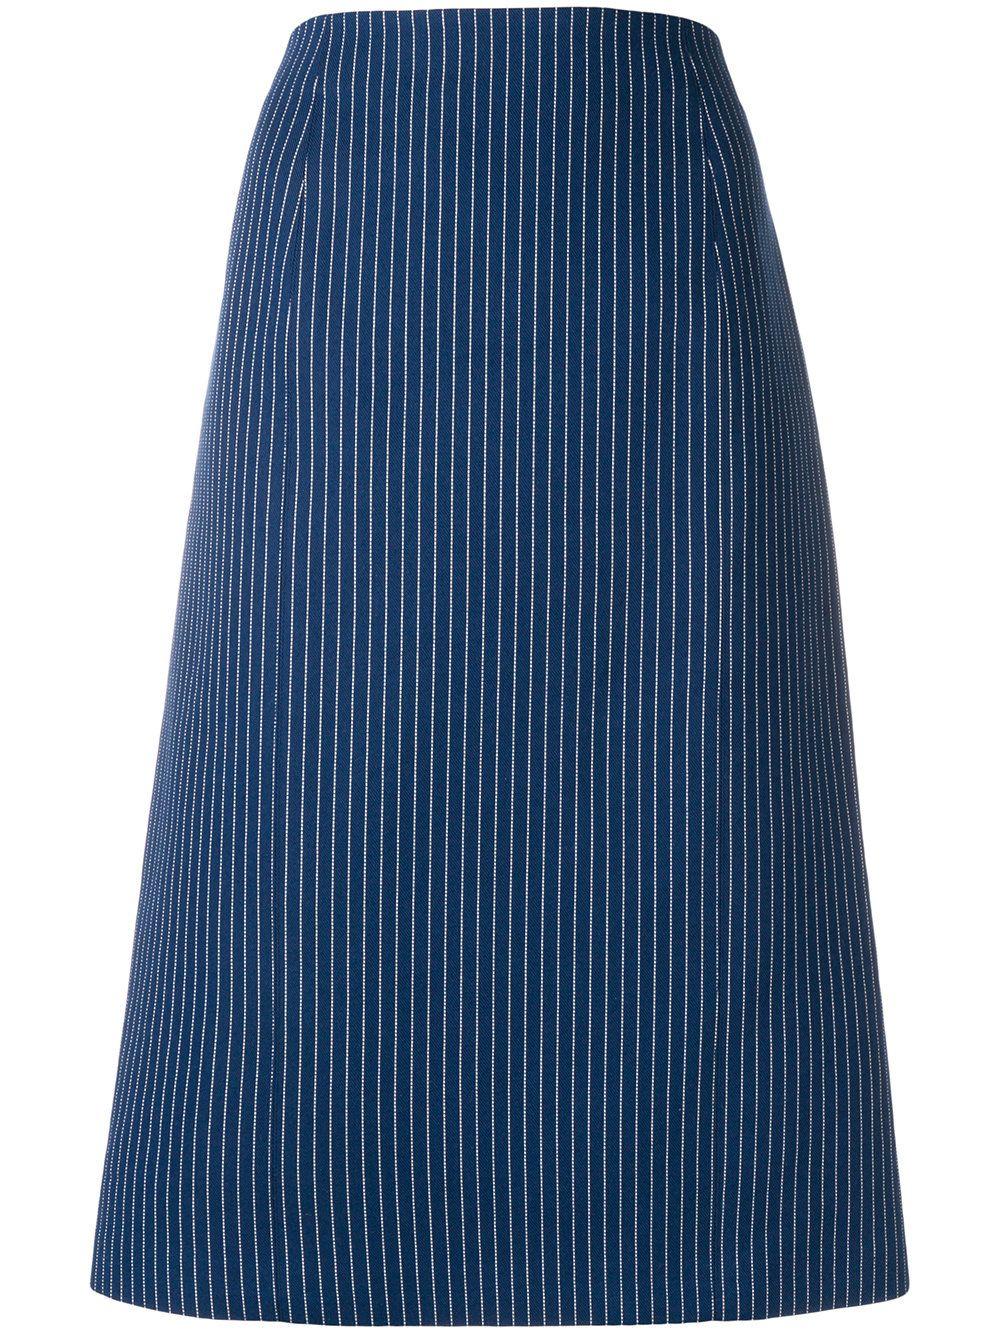 fendi - Pinstripes Skirt